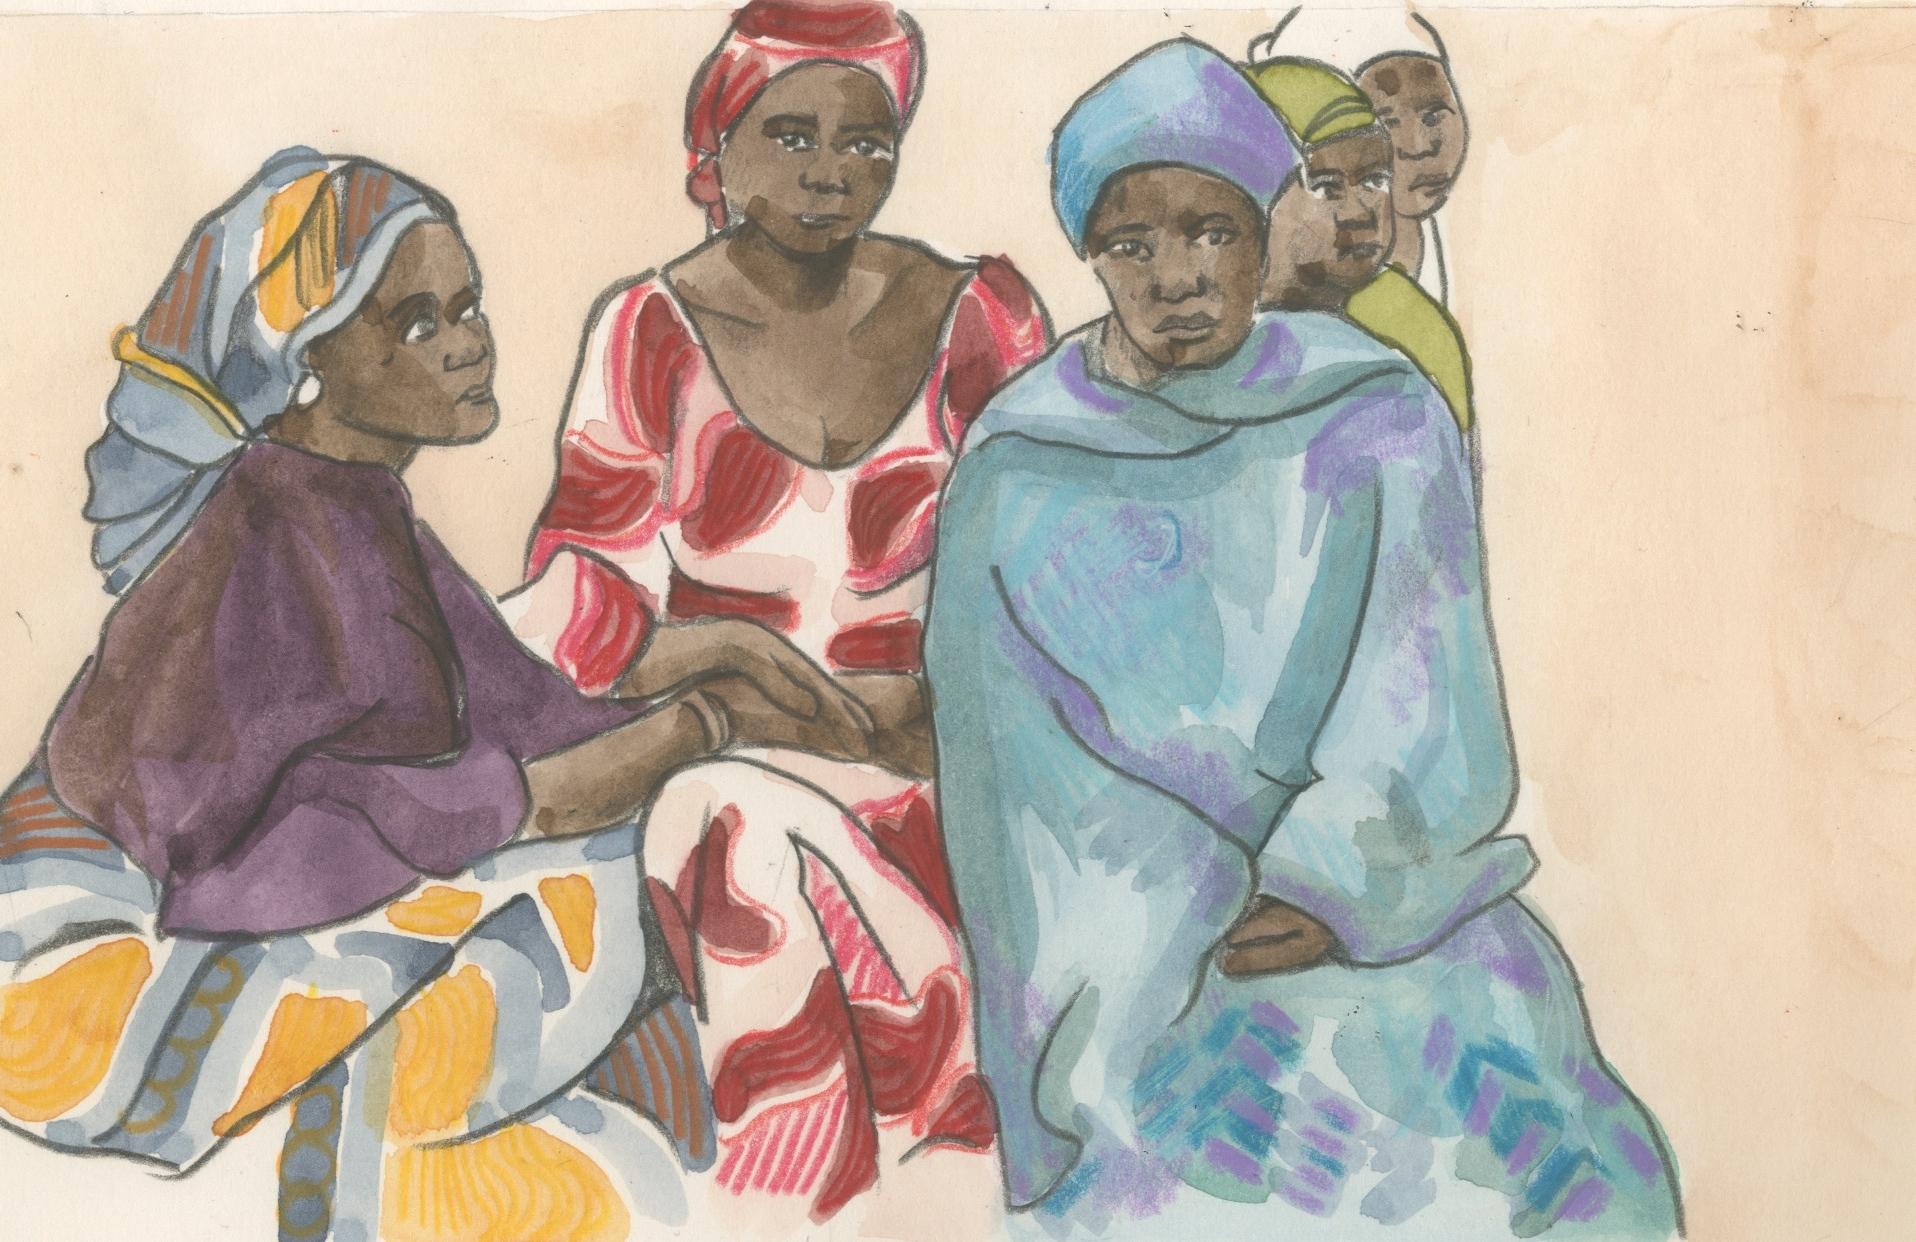 02/02/15 School girls risking their lives to defy Boko Haram and return to school in Chibok, Nigeria